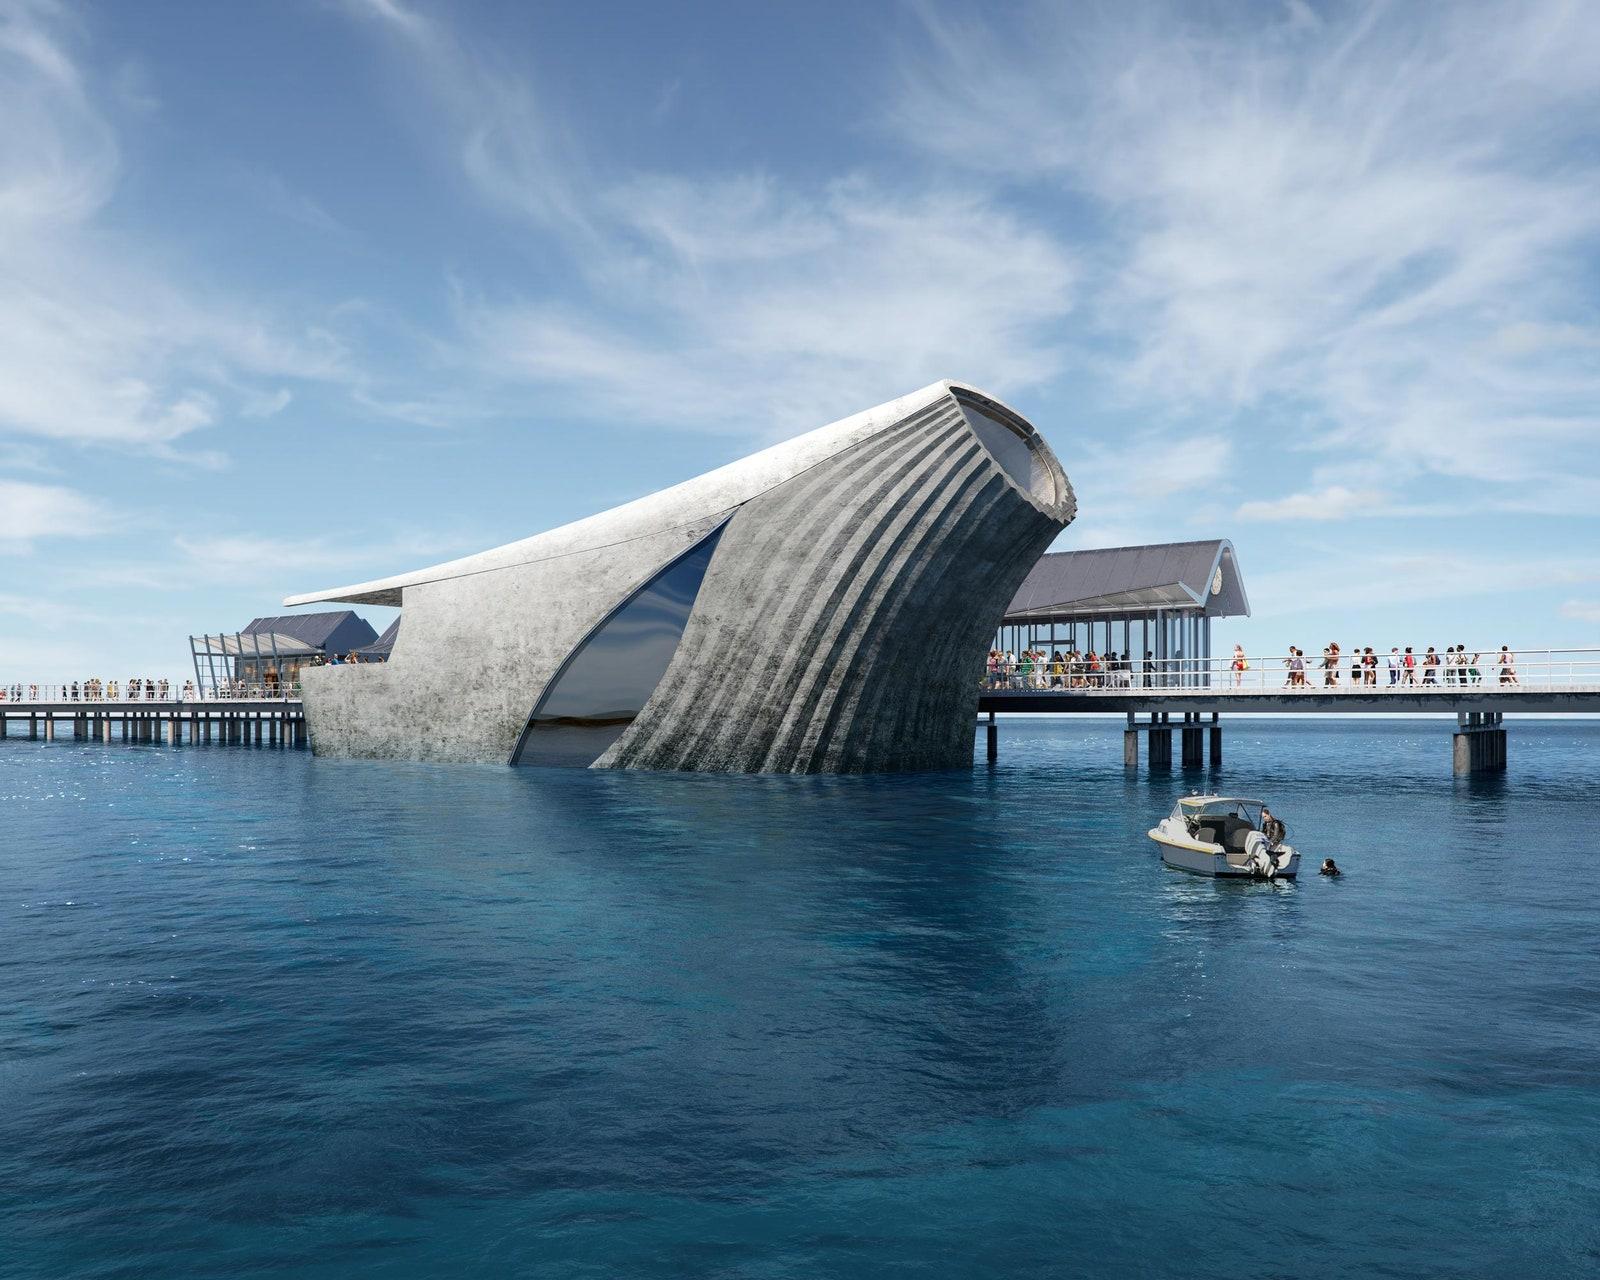 Australia will run the Natural Marine Laboratory with amazing architecture